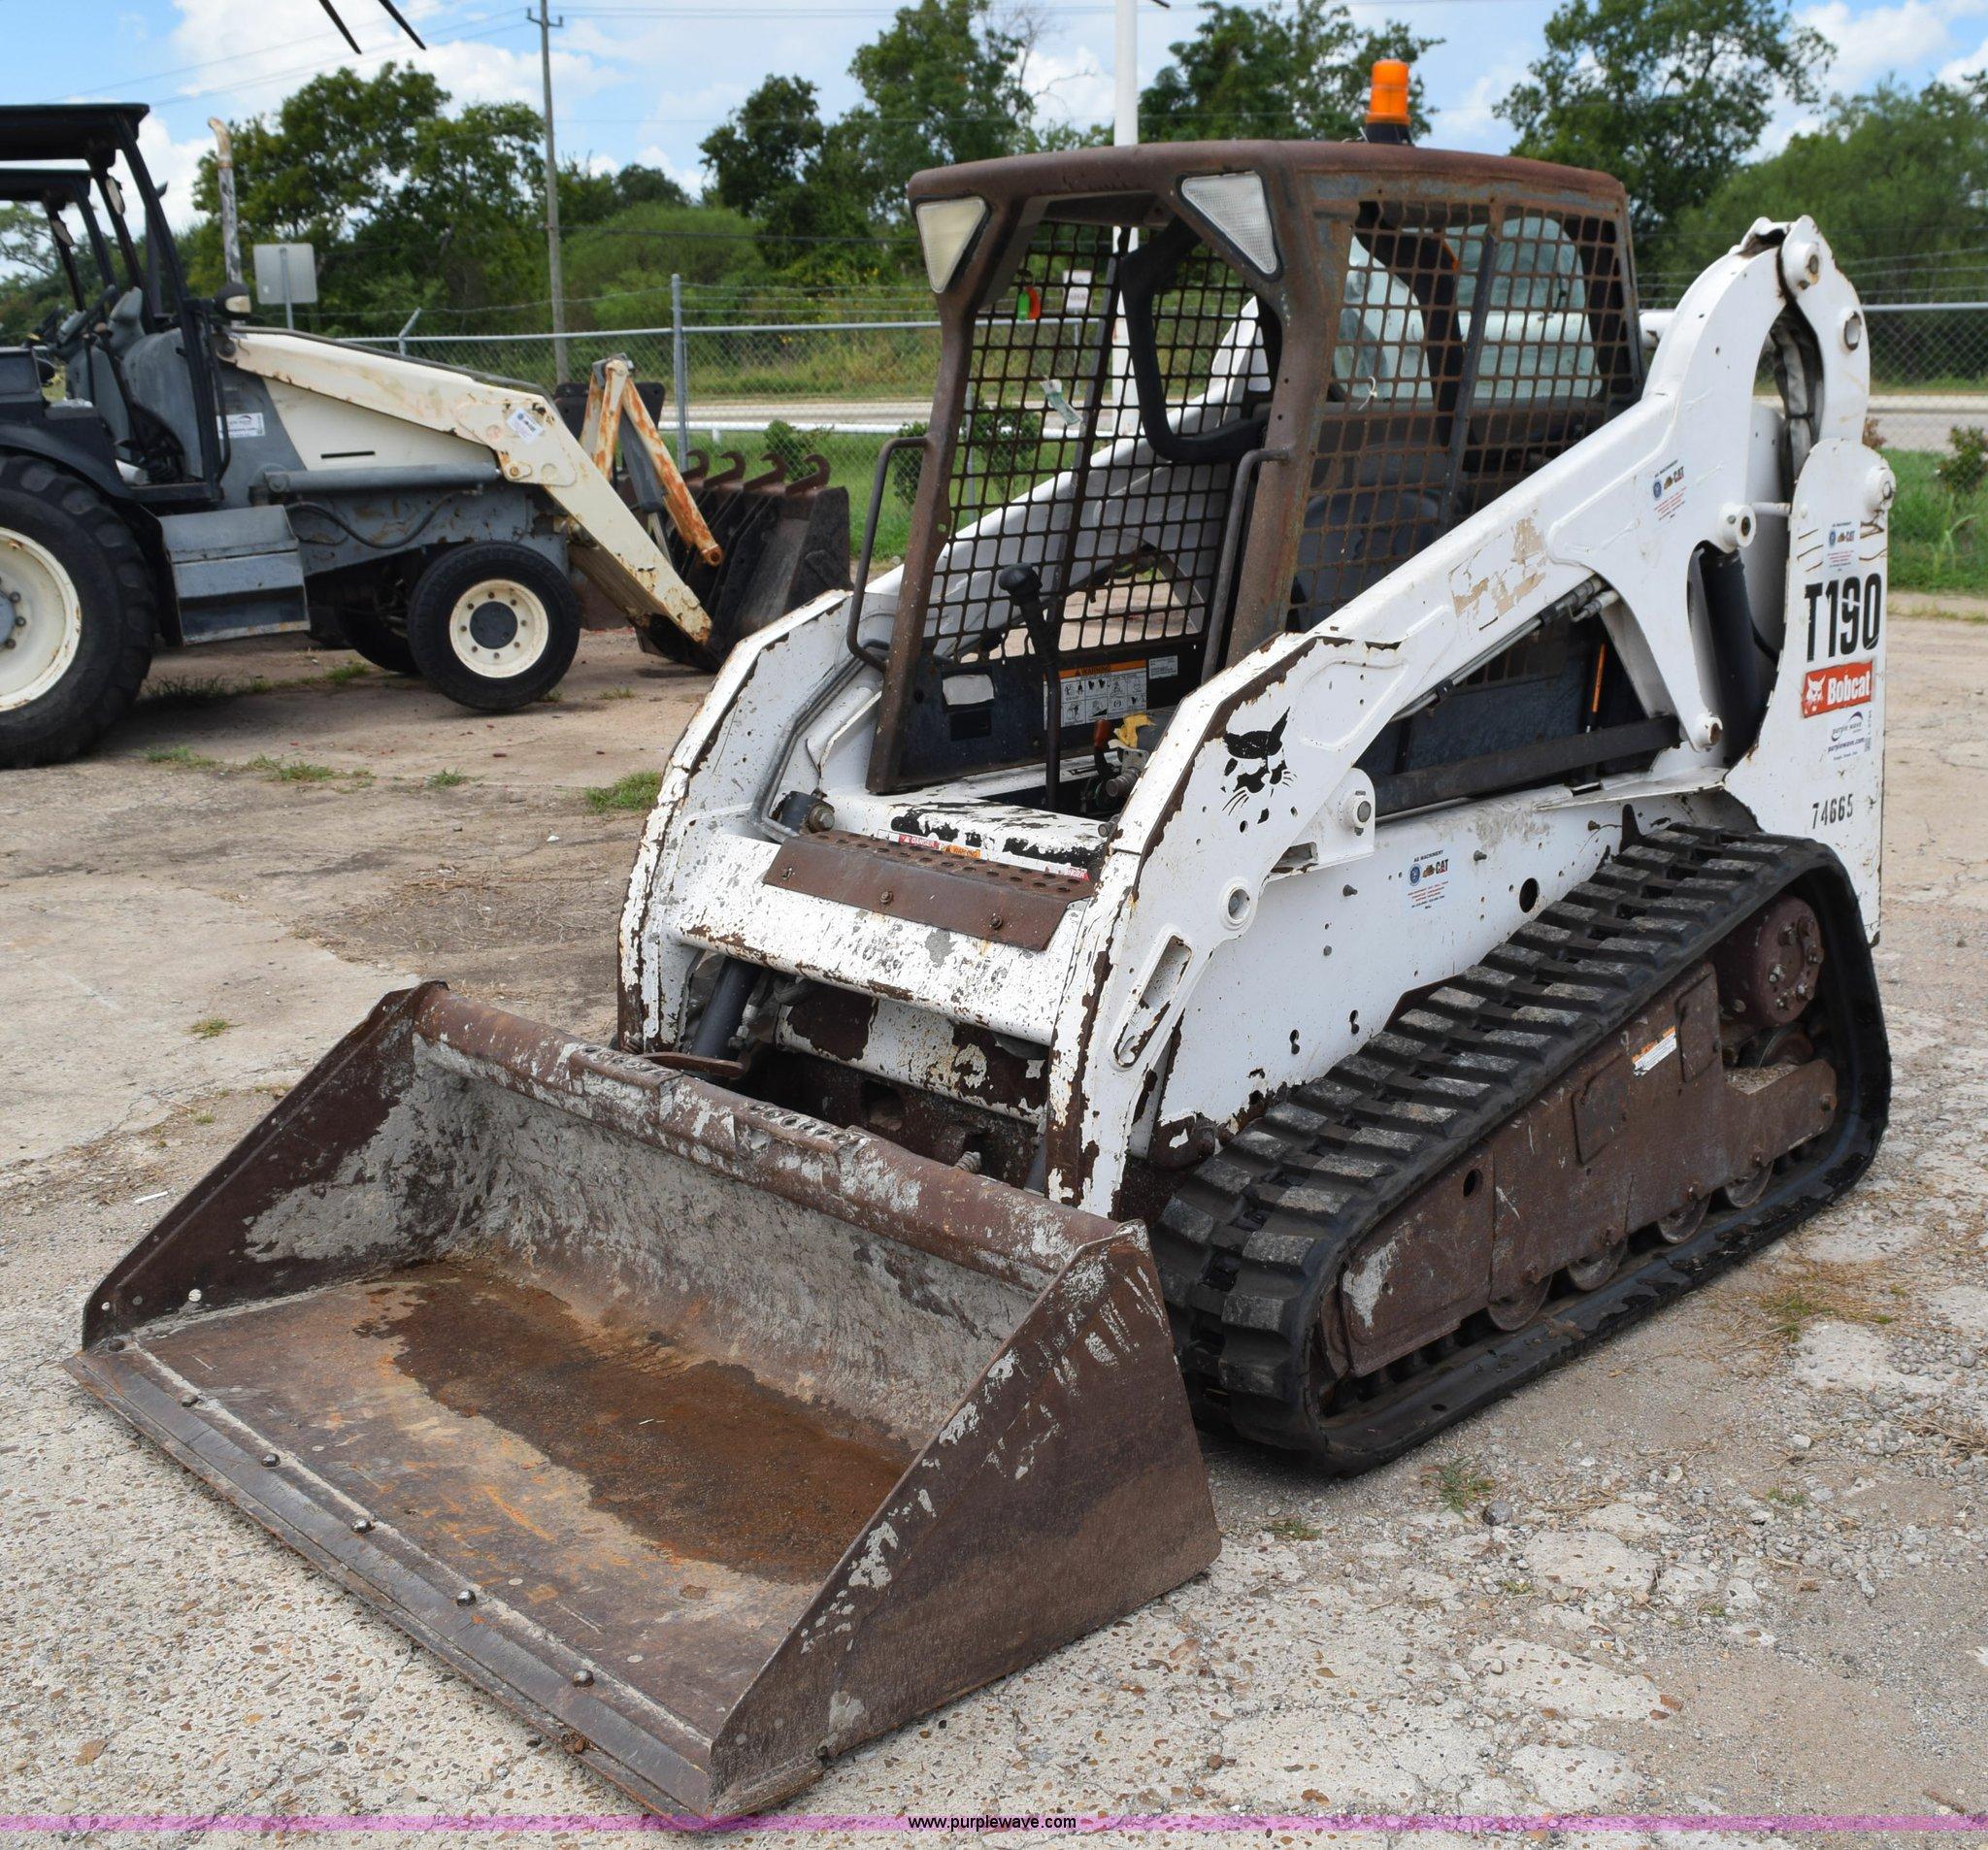 2007 Bobcat T190 Skid Steer Item L5785 Sold September 1